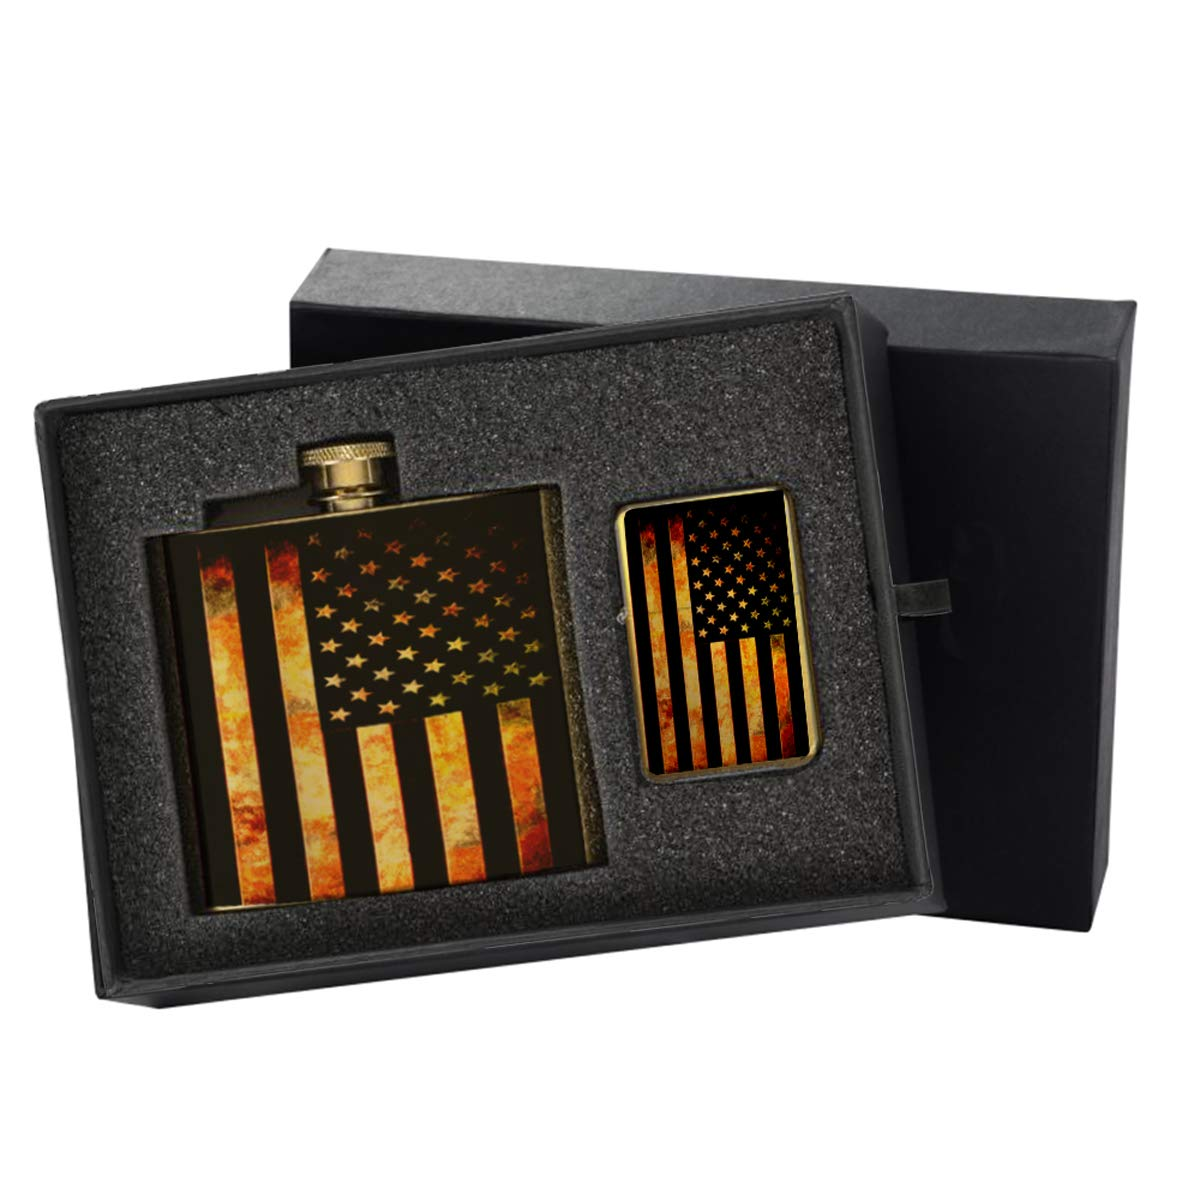 American Flag Grunge Metal - Gold Lighter and Pocket Hip Liquor Flask Survival Camping Gift Box Set